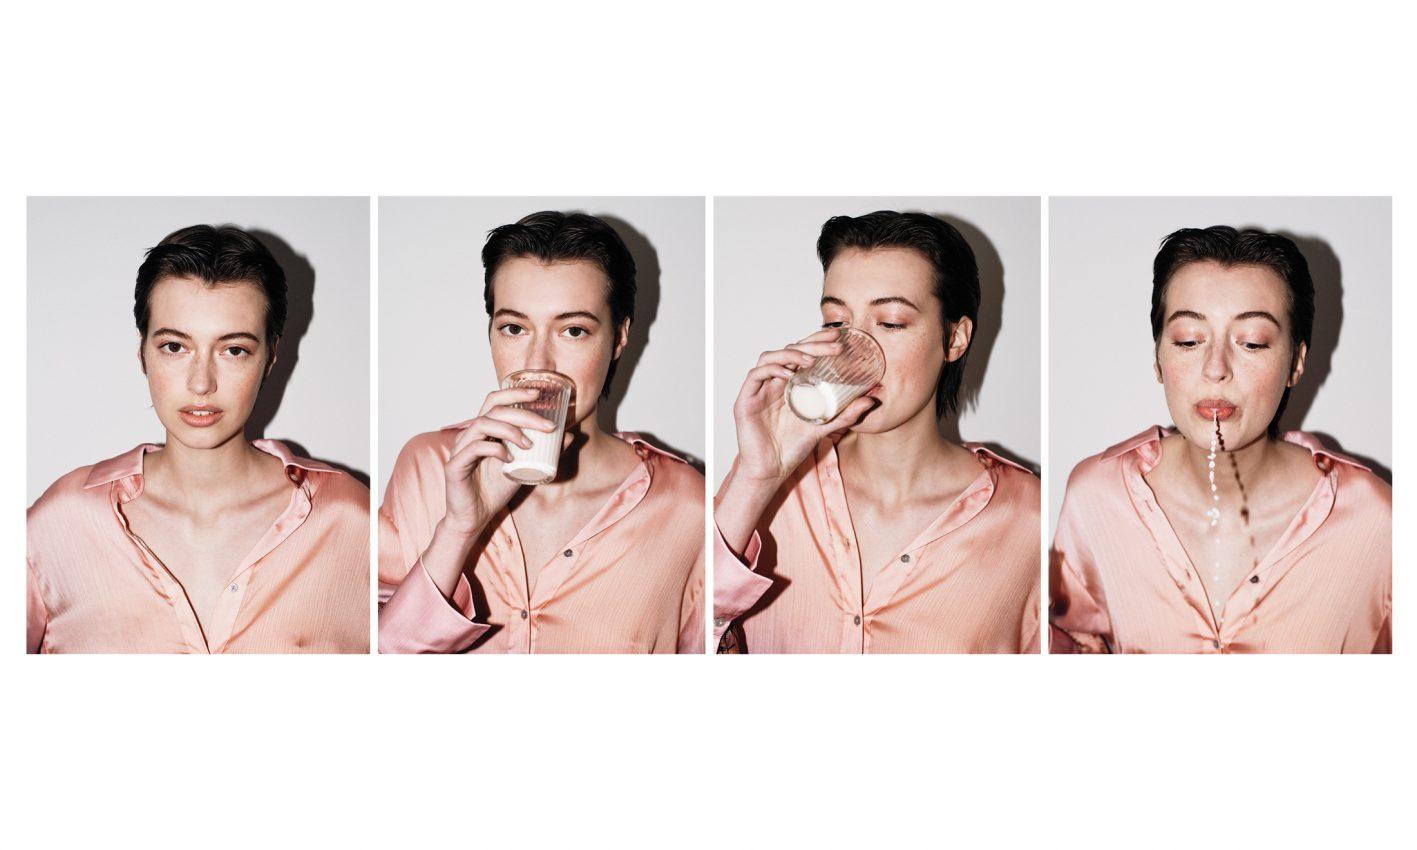 4up photograph of model Iris Delcourt of Viva models drinking milk